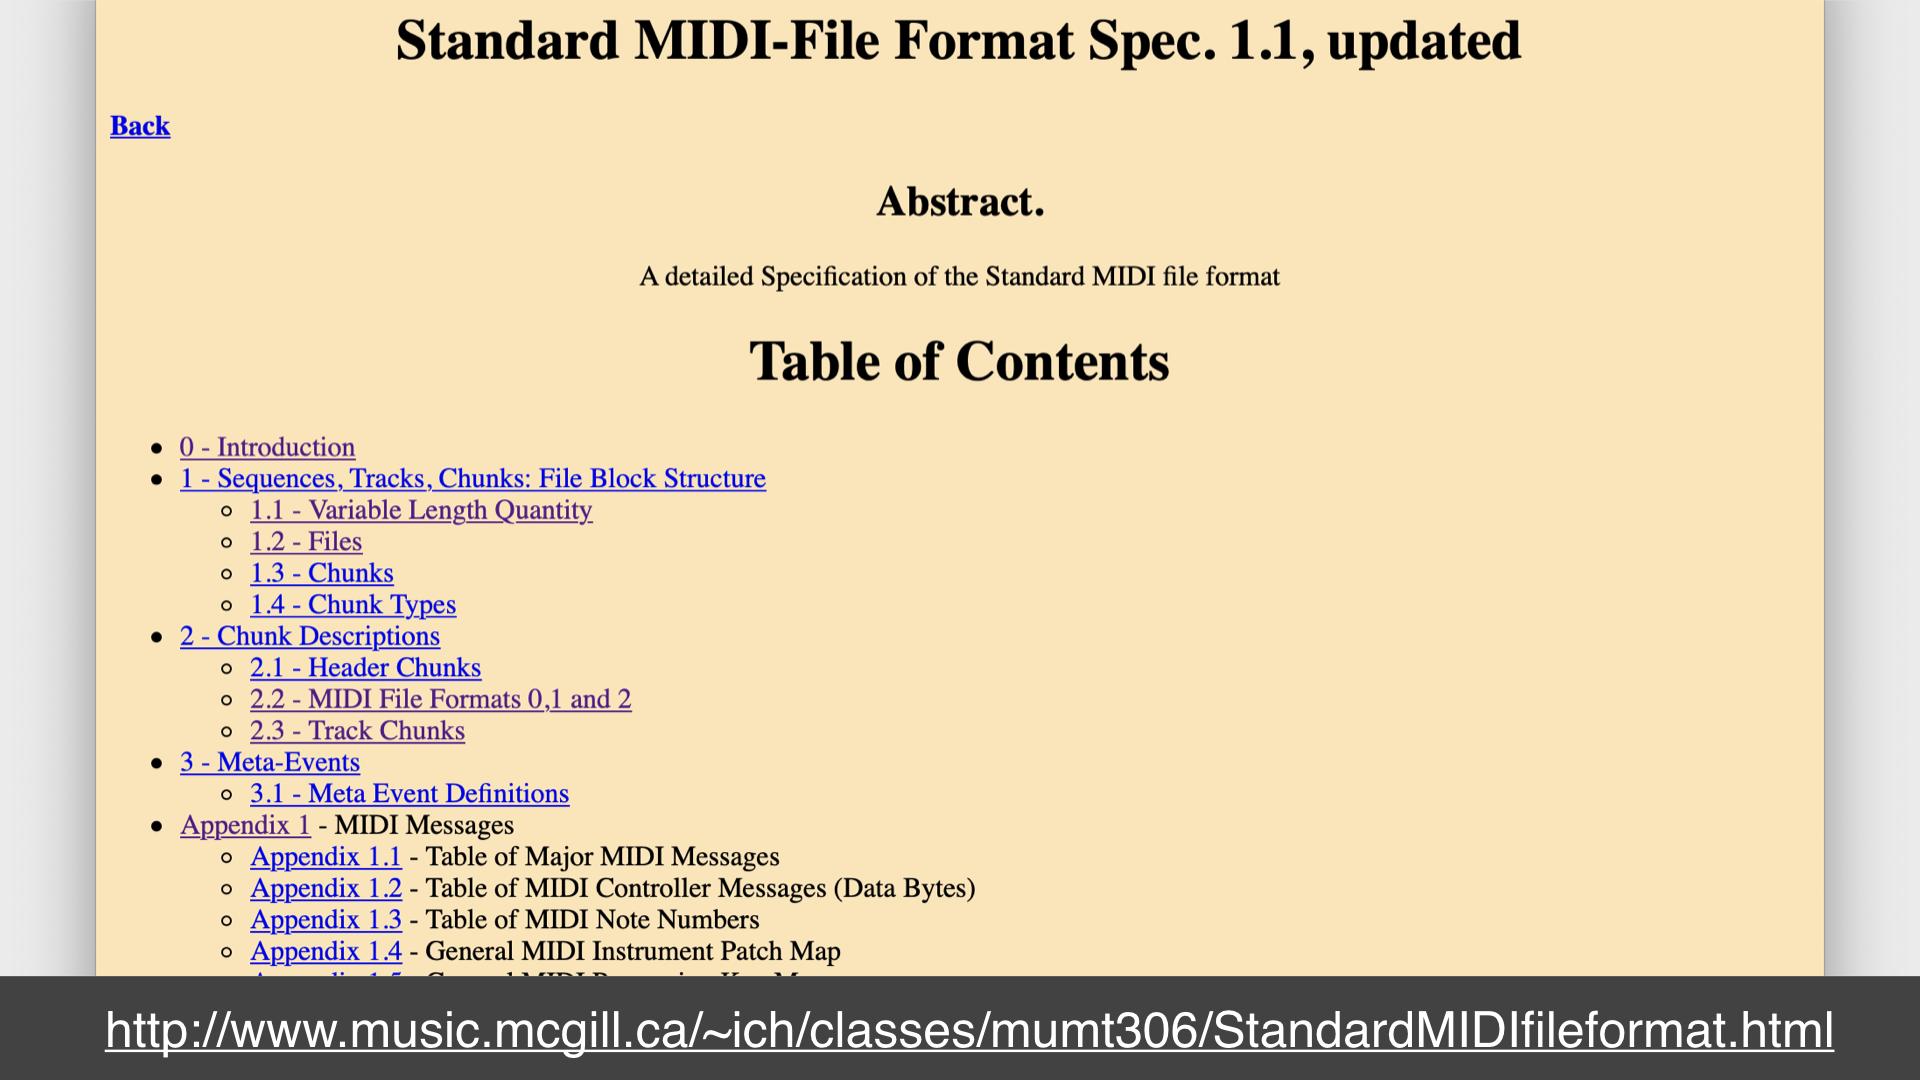 Screenshot of a webpage describing the MIDI file format specification; url: http://www.music.mcgill.ca/~ich/classes/mumt306/StandardMIDIfileformat.html